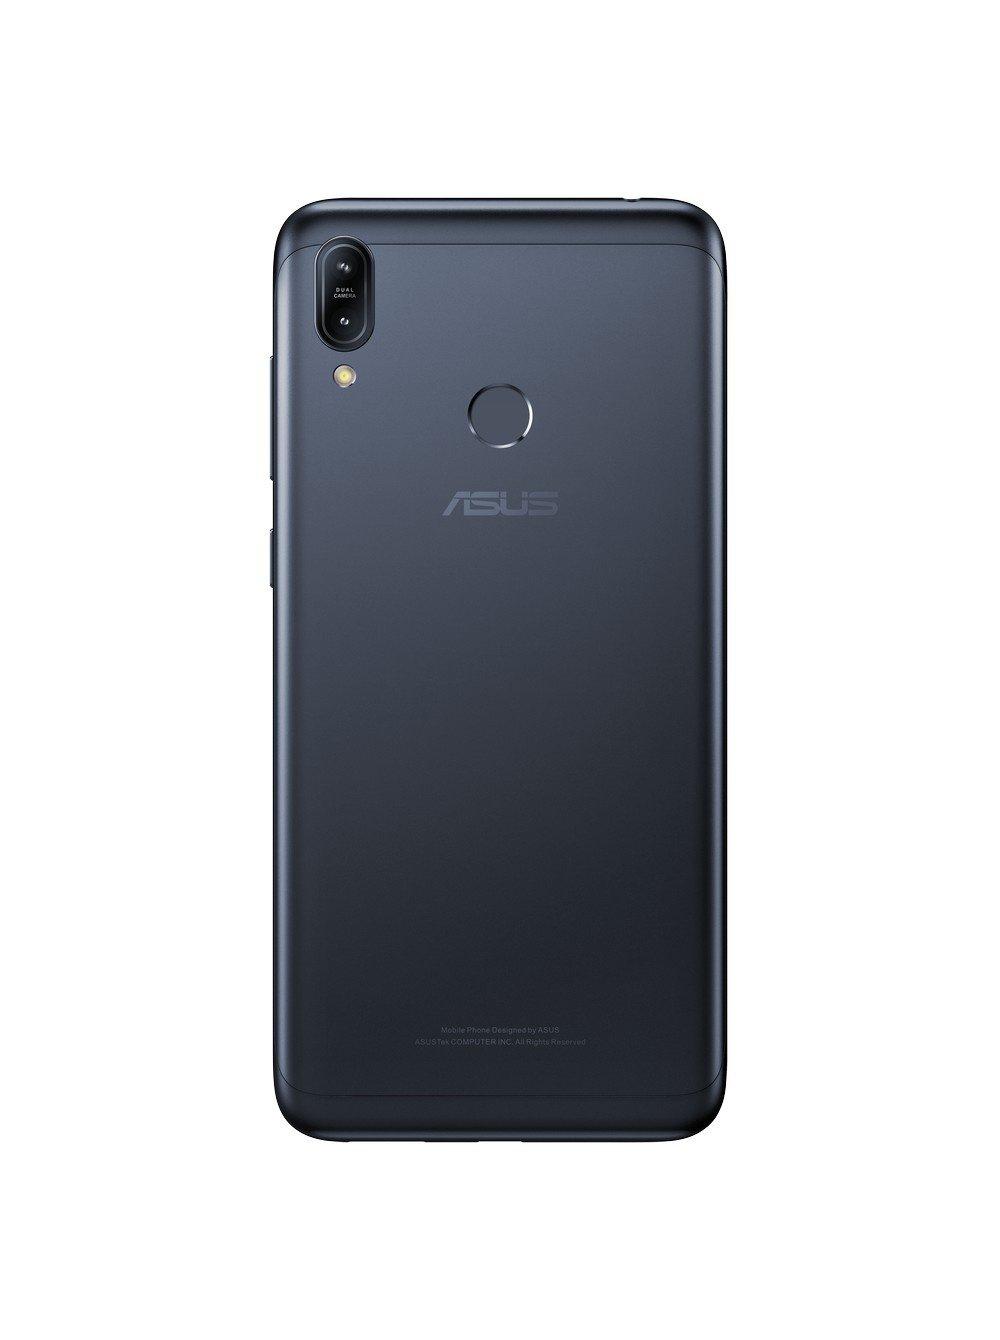 Смартфон Asus ZenFone Max (M2) (ZB633KL-4A070EU) 4/32 GB DUALSIM Black с чехлом фото 11